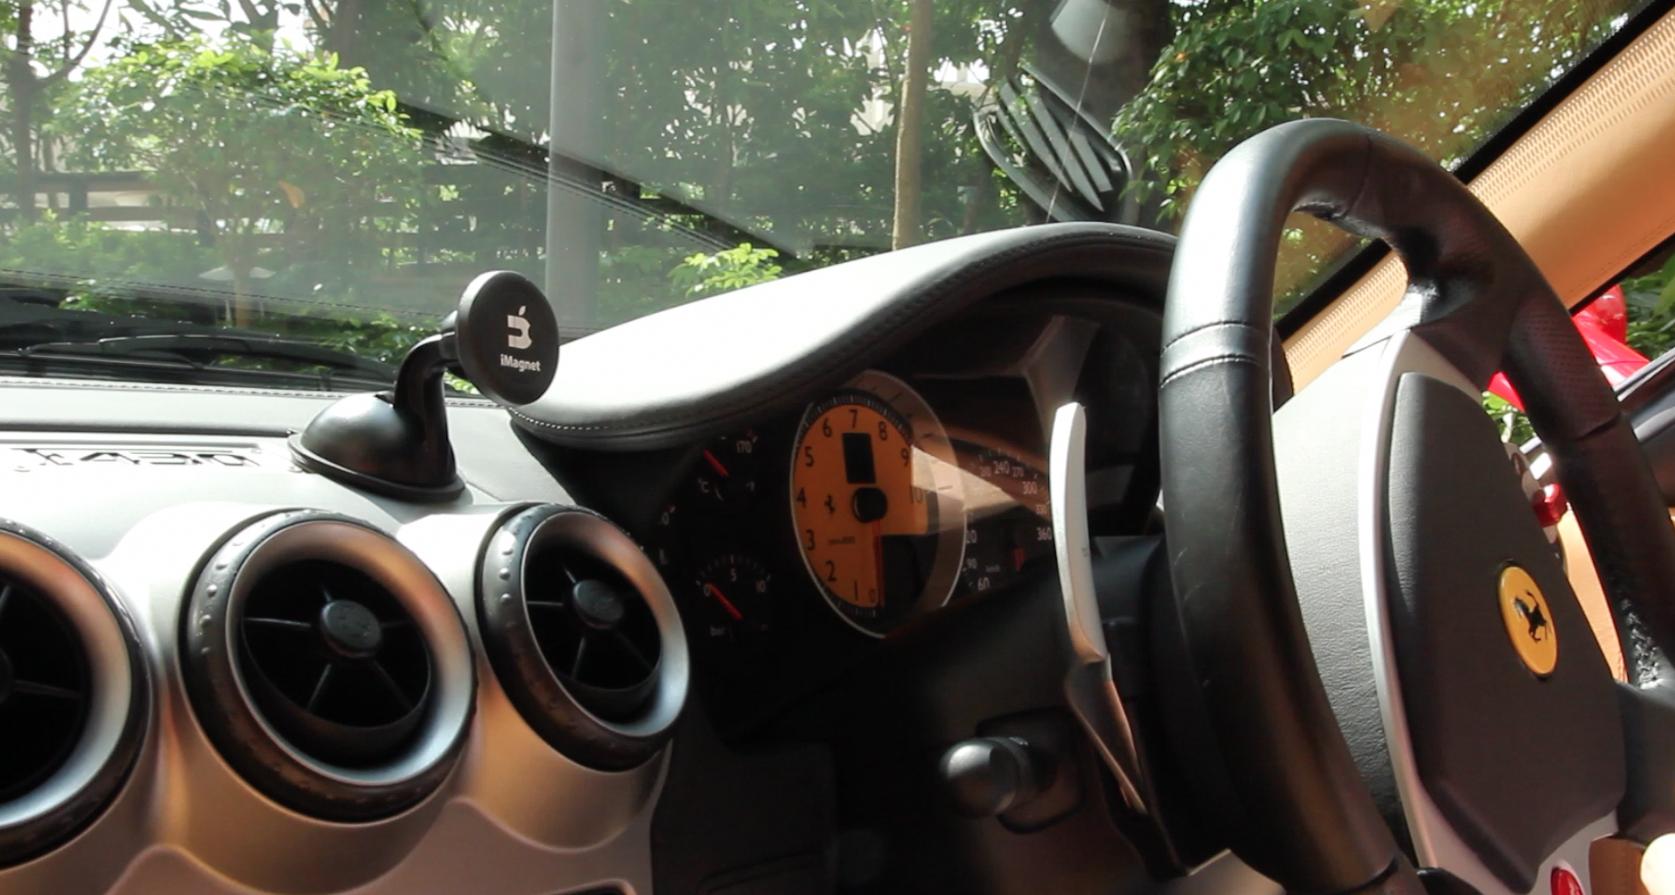 An Imagnet Car Phone Holder Mount On A Ferrari Luxury Exotic Car